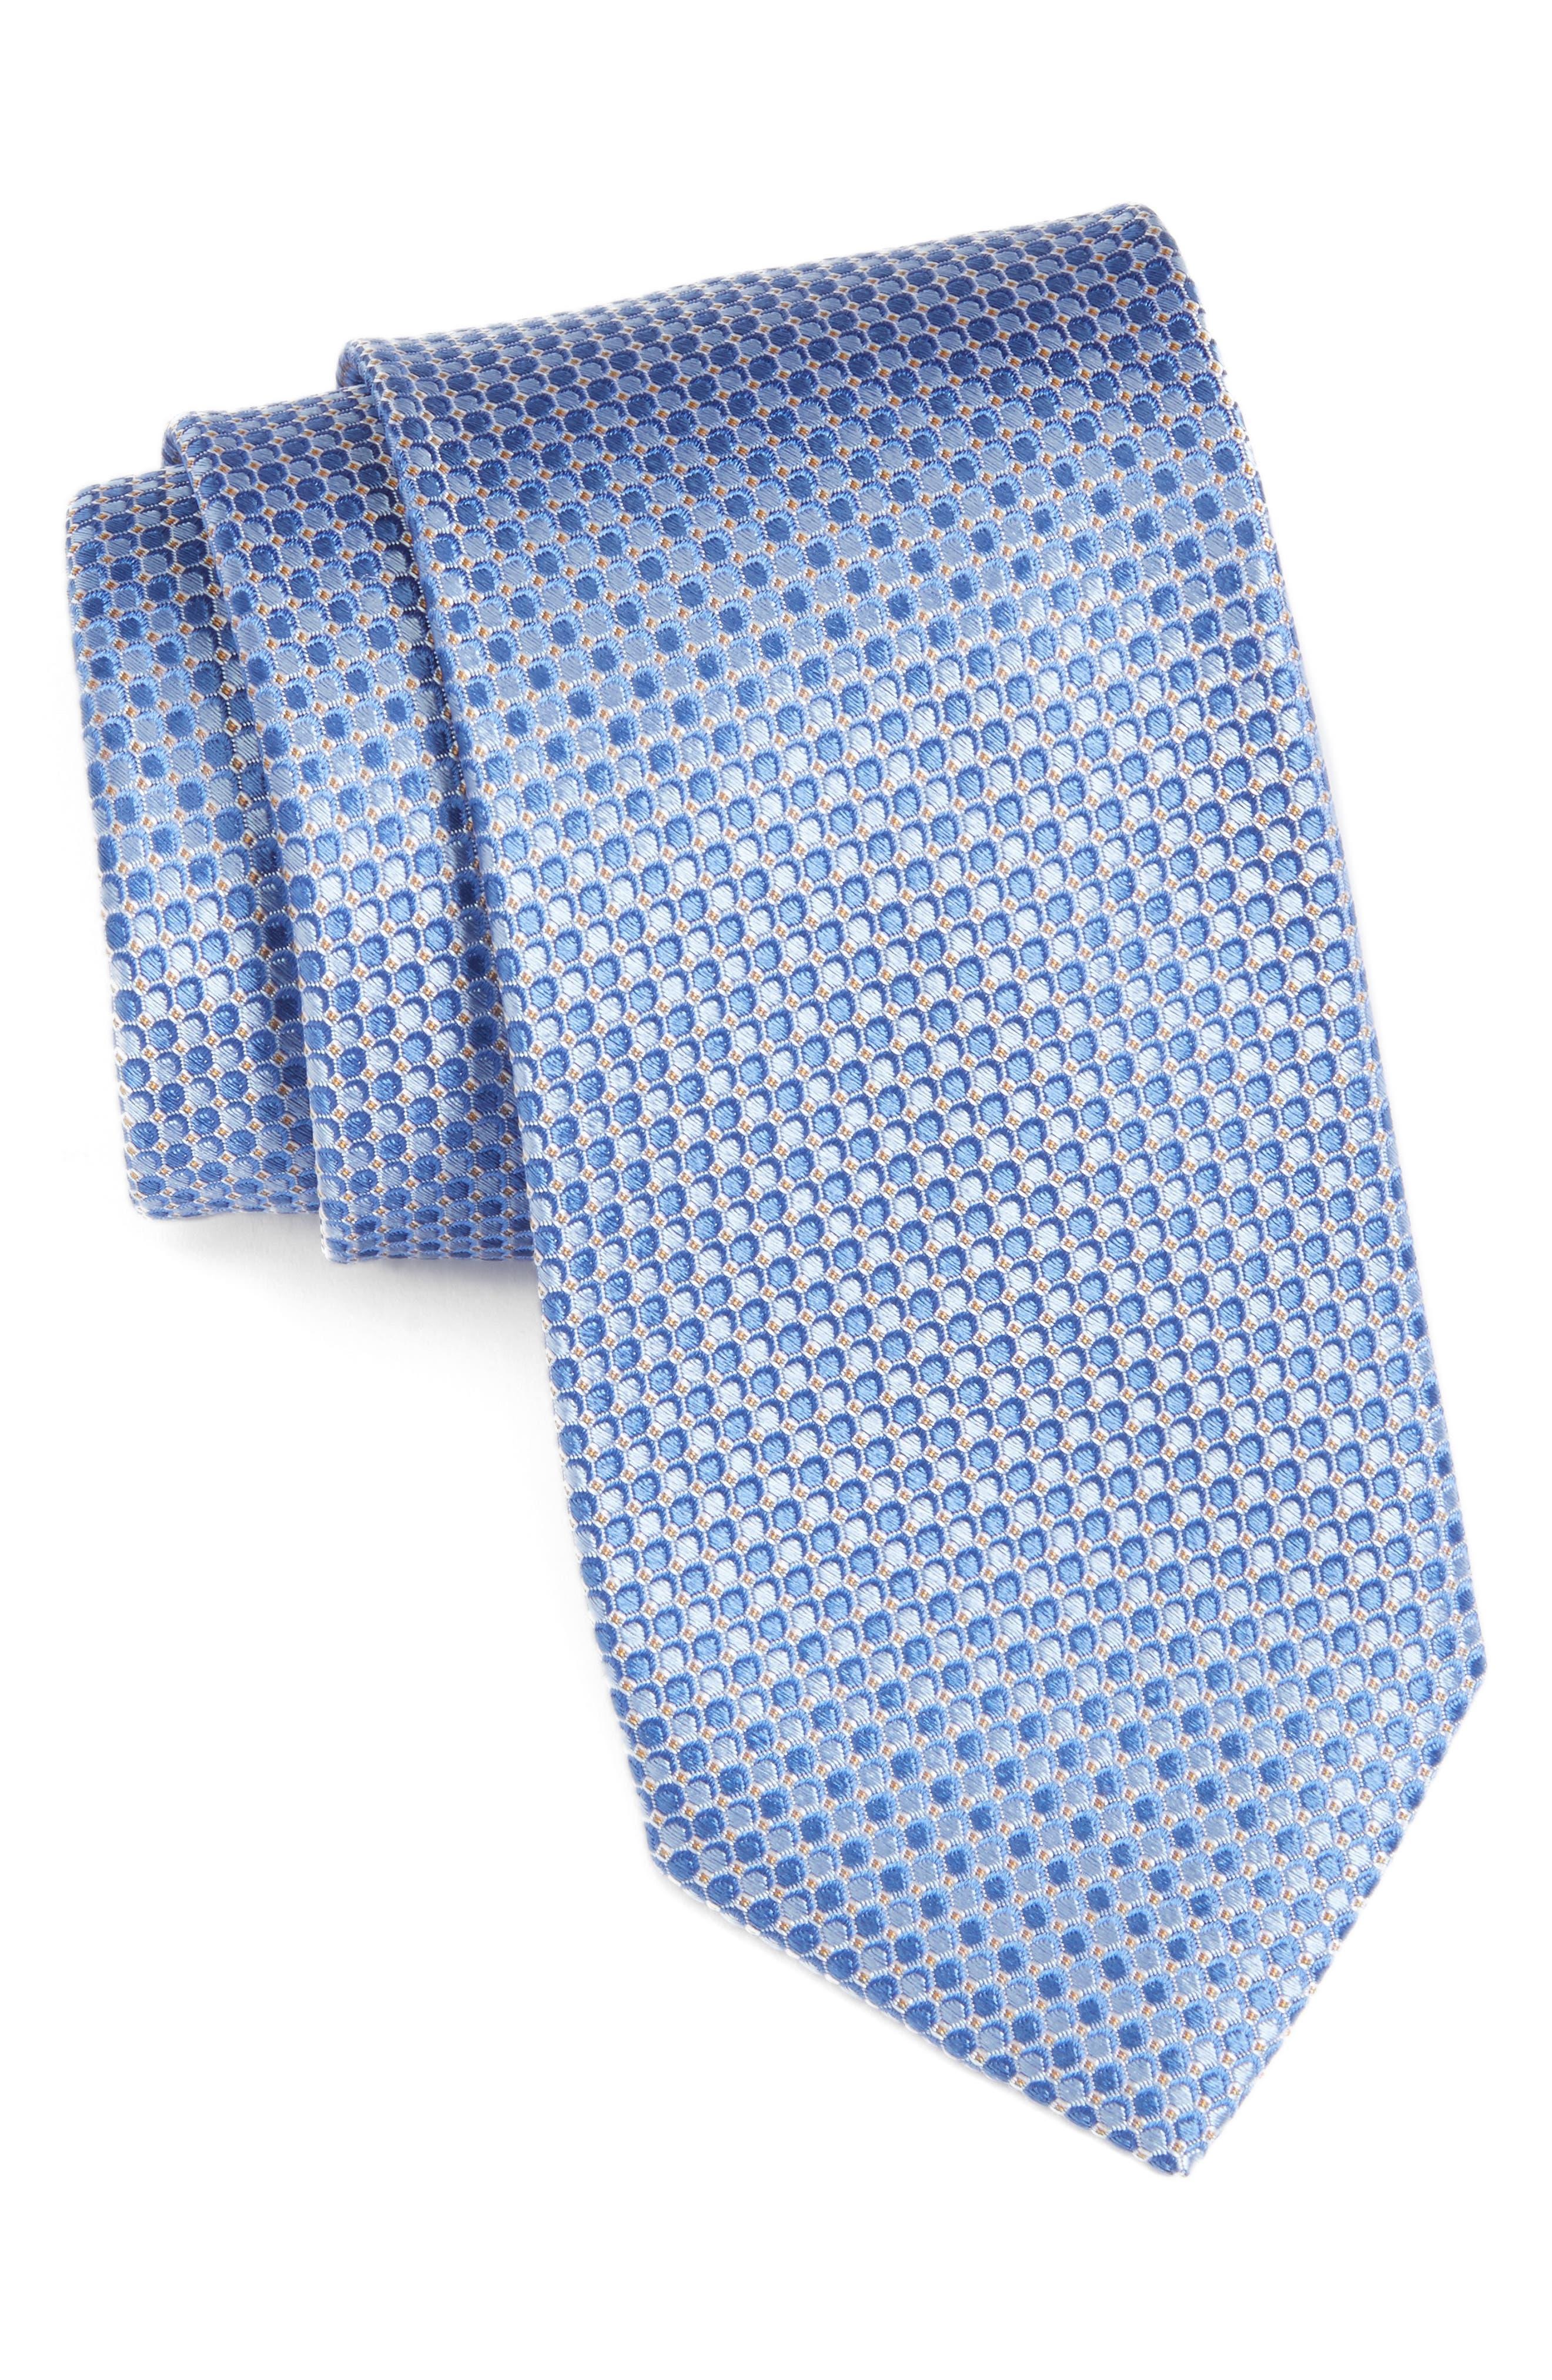 Alternate Image 1 Selected - Nordstrom Men's Shop Alghero Micro Silk Tie